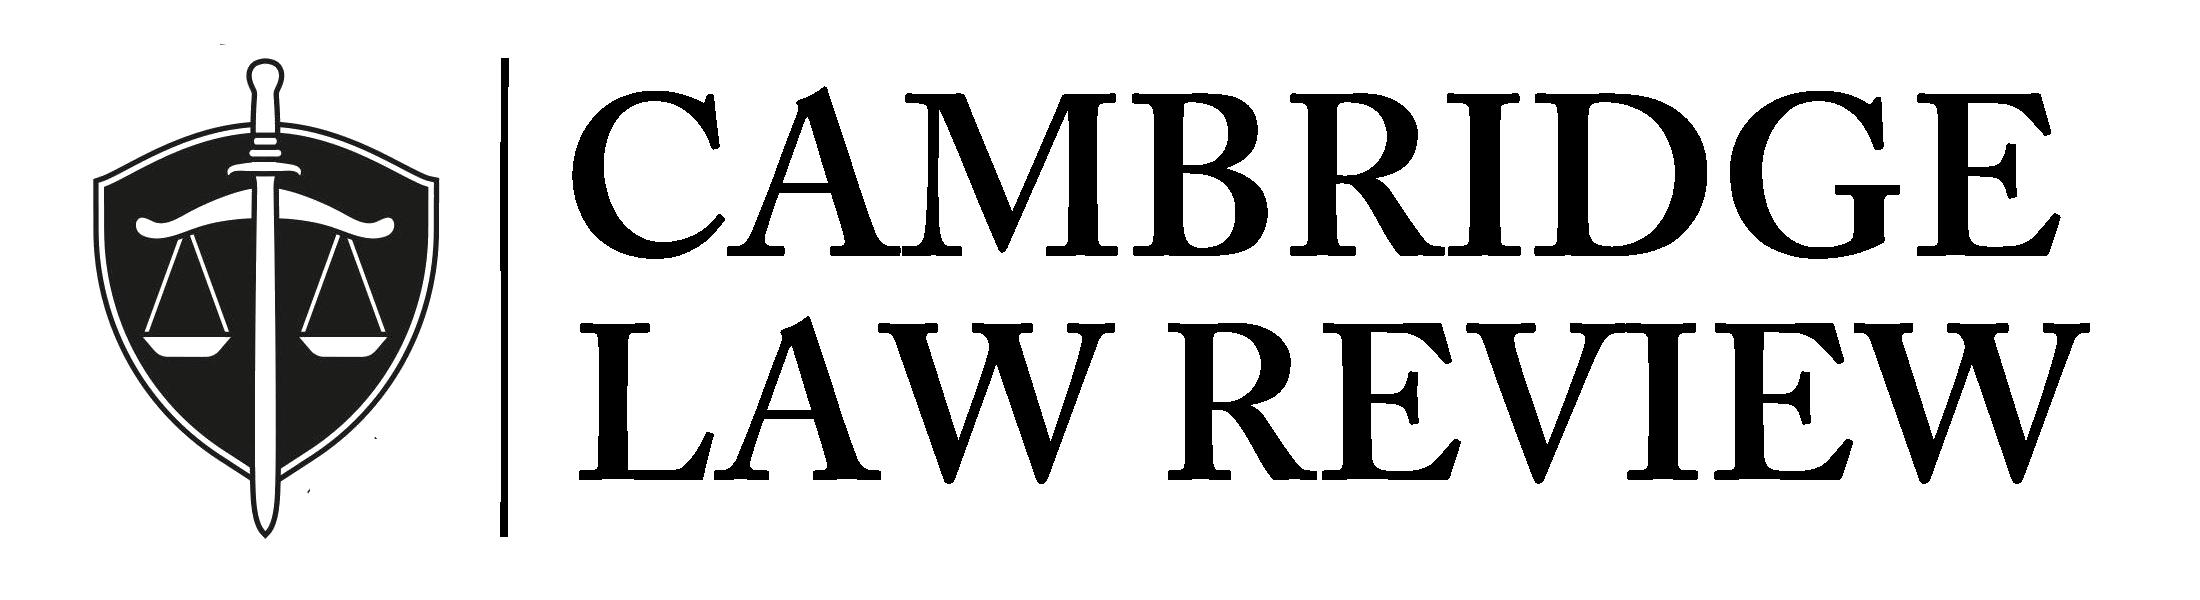 Cambridge Law Review logo